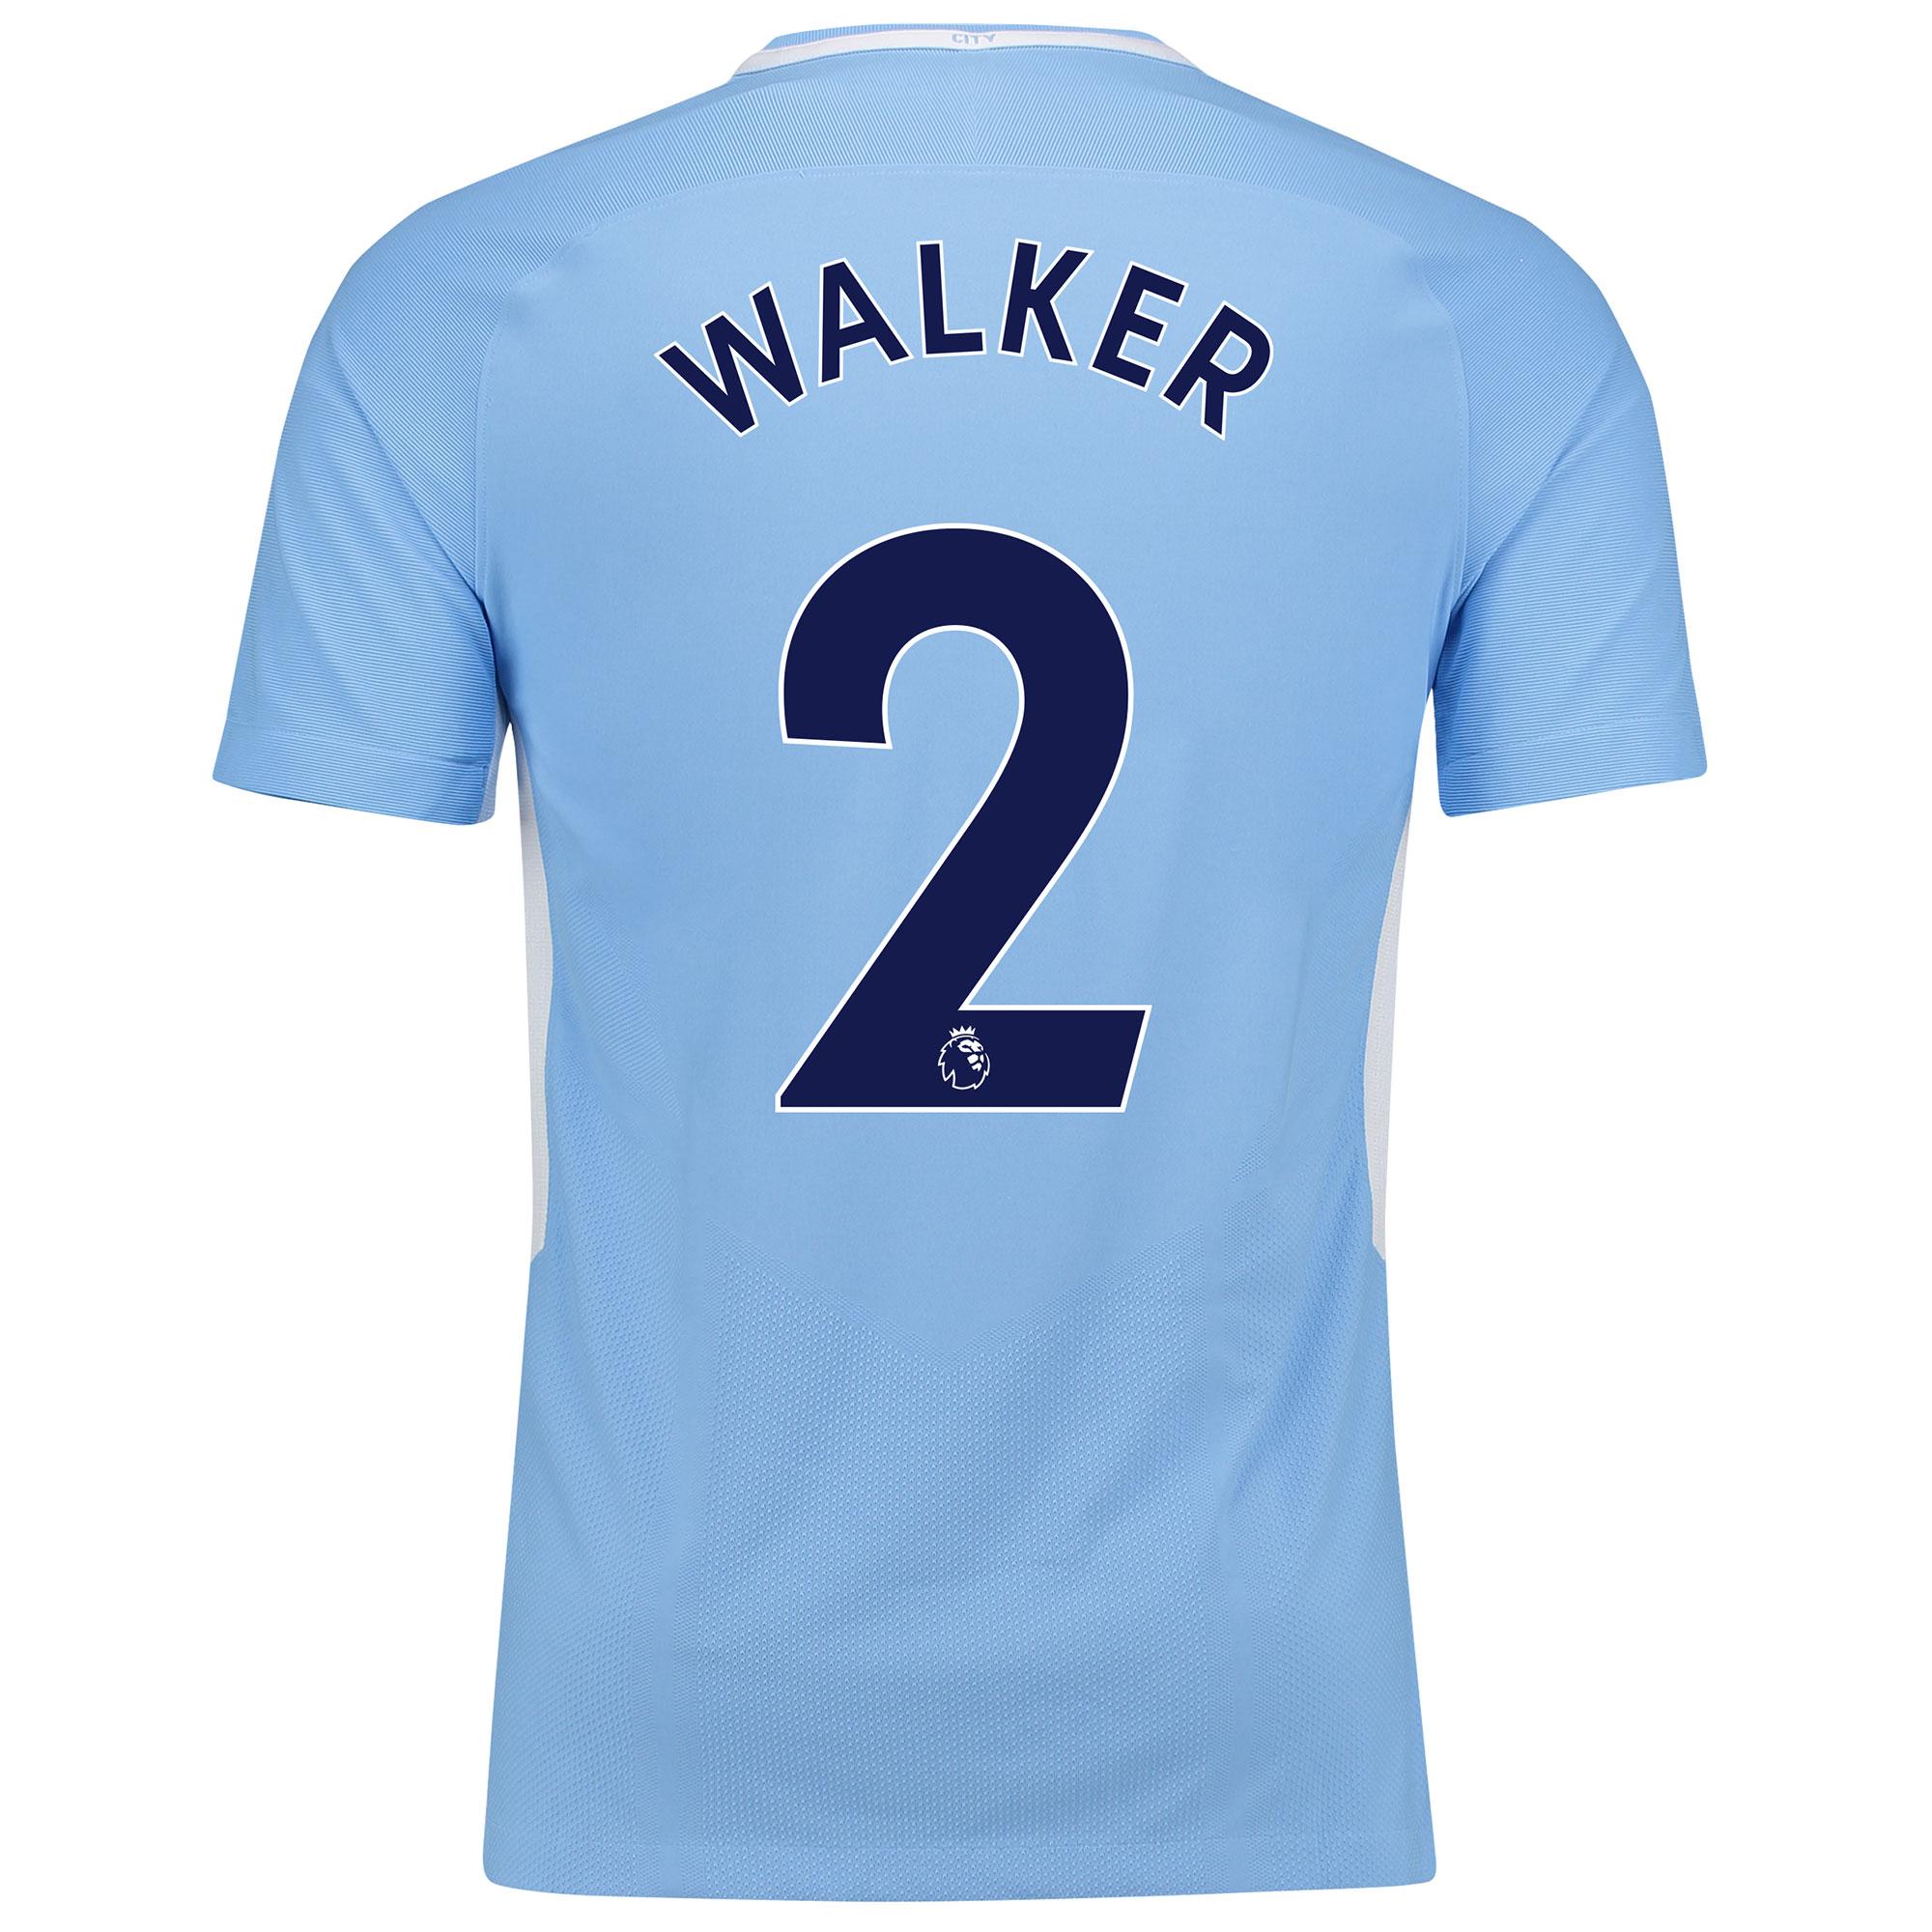 Manchester City Home Vapor Match Shirt 2017-18 with Walker 2 printing